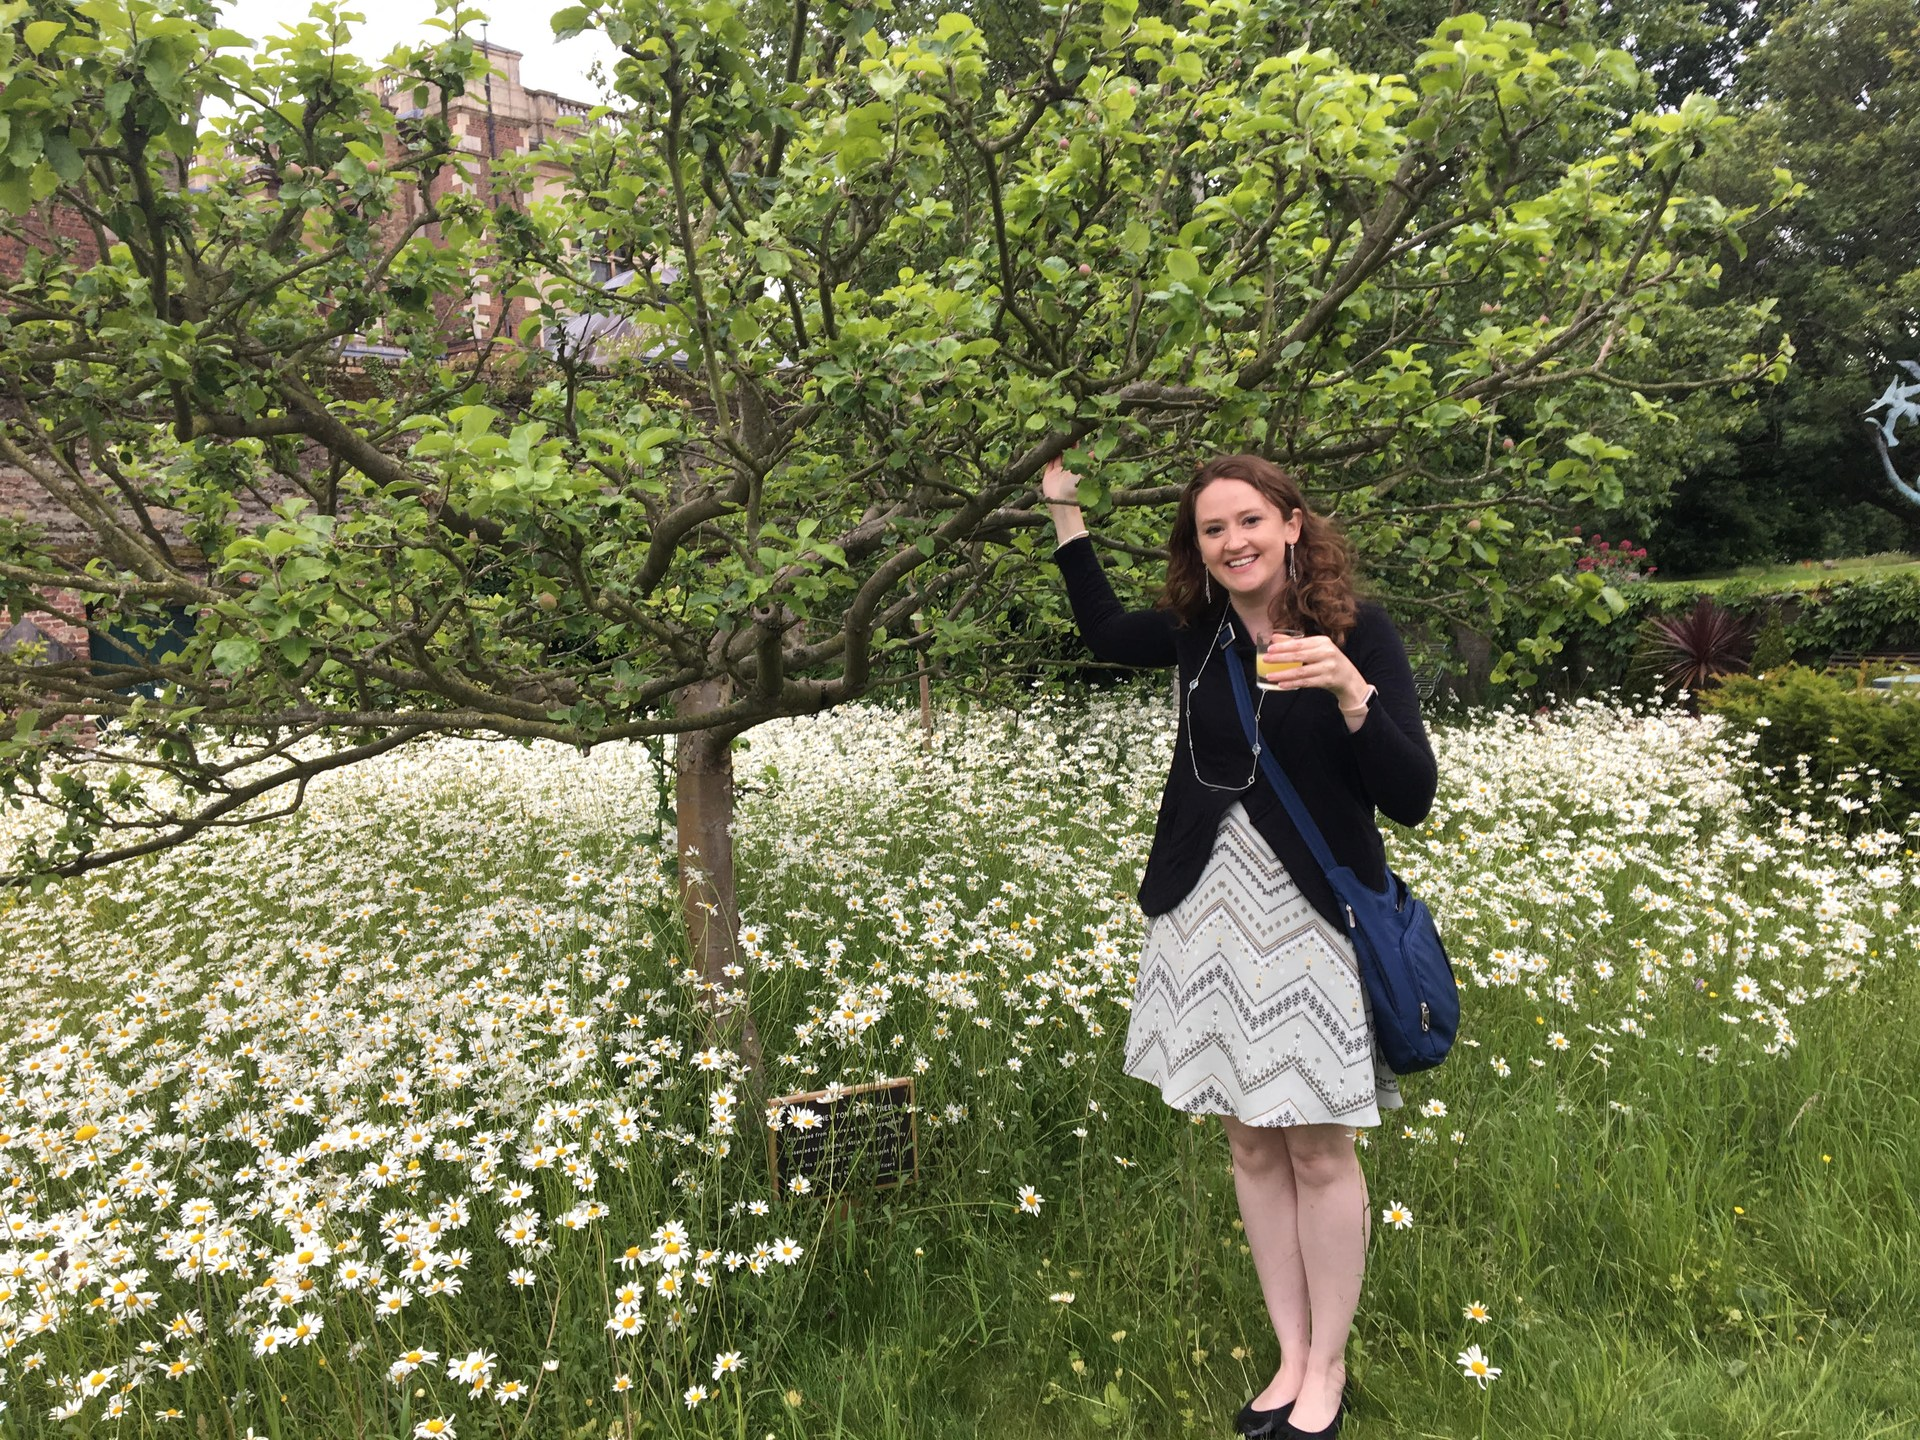 Enjoying some apple juice under a descendant of Issac Newton's tree.